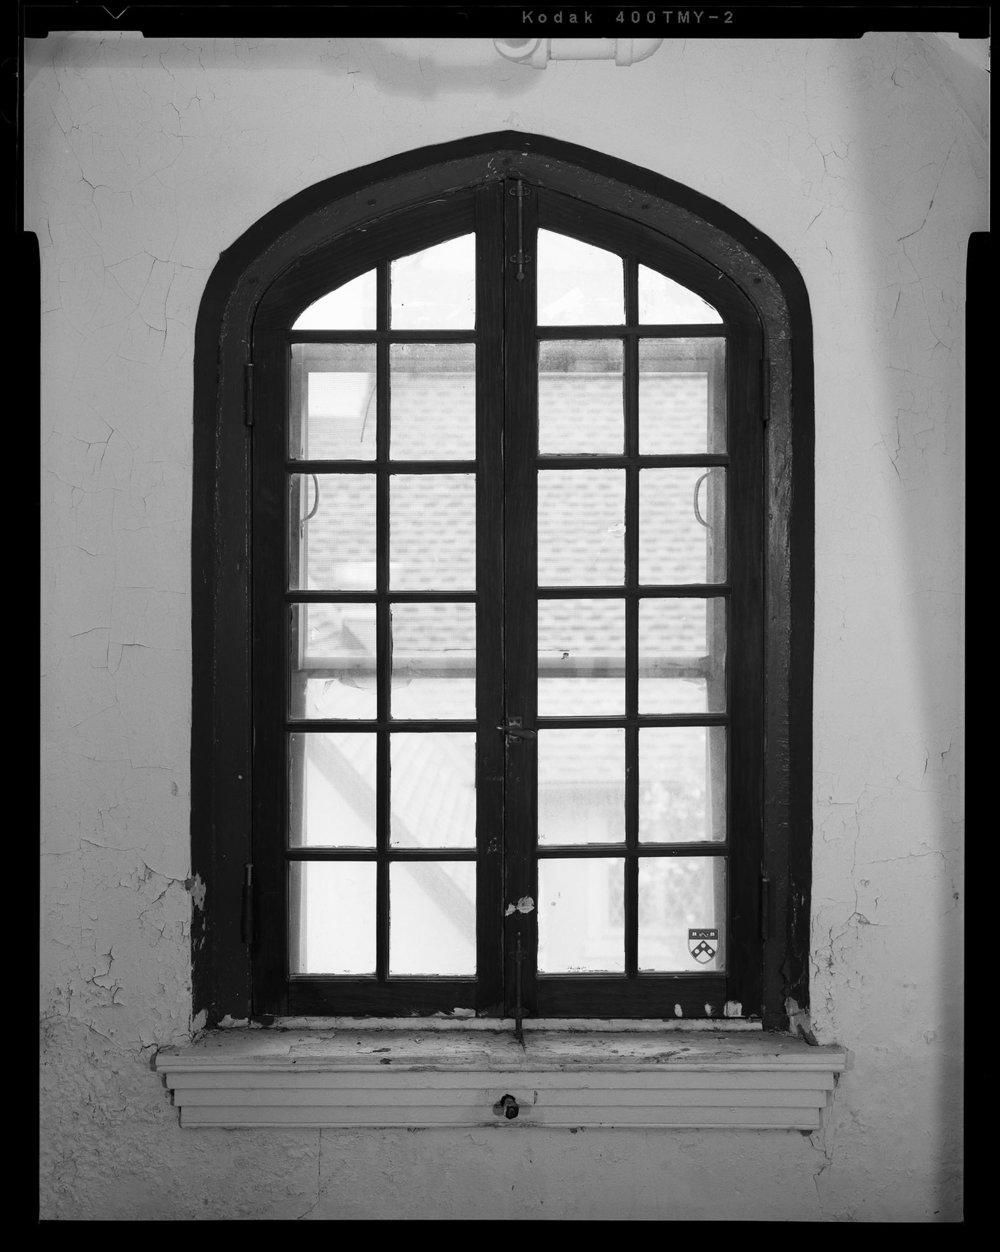 Window_Detail_Attic_Bedroom_No_1.jpg